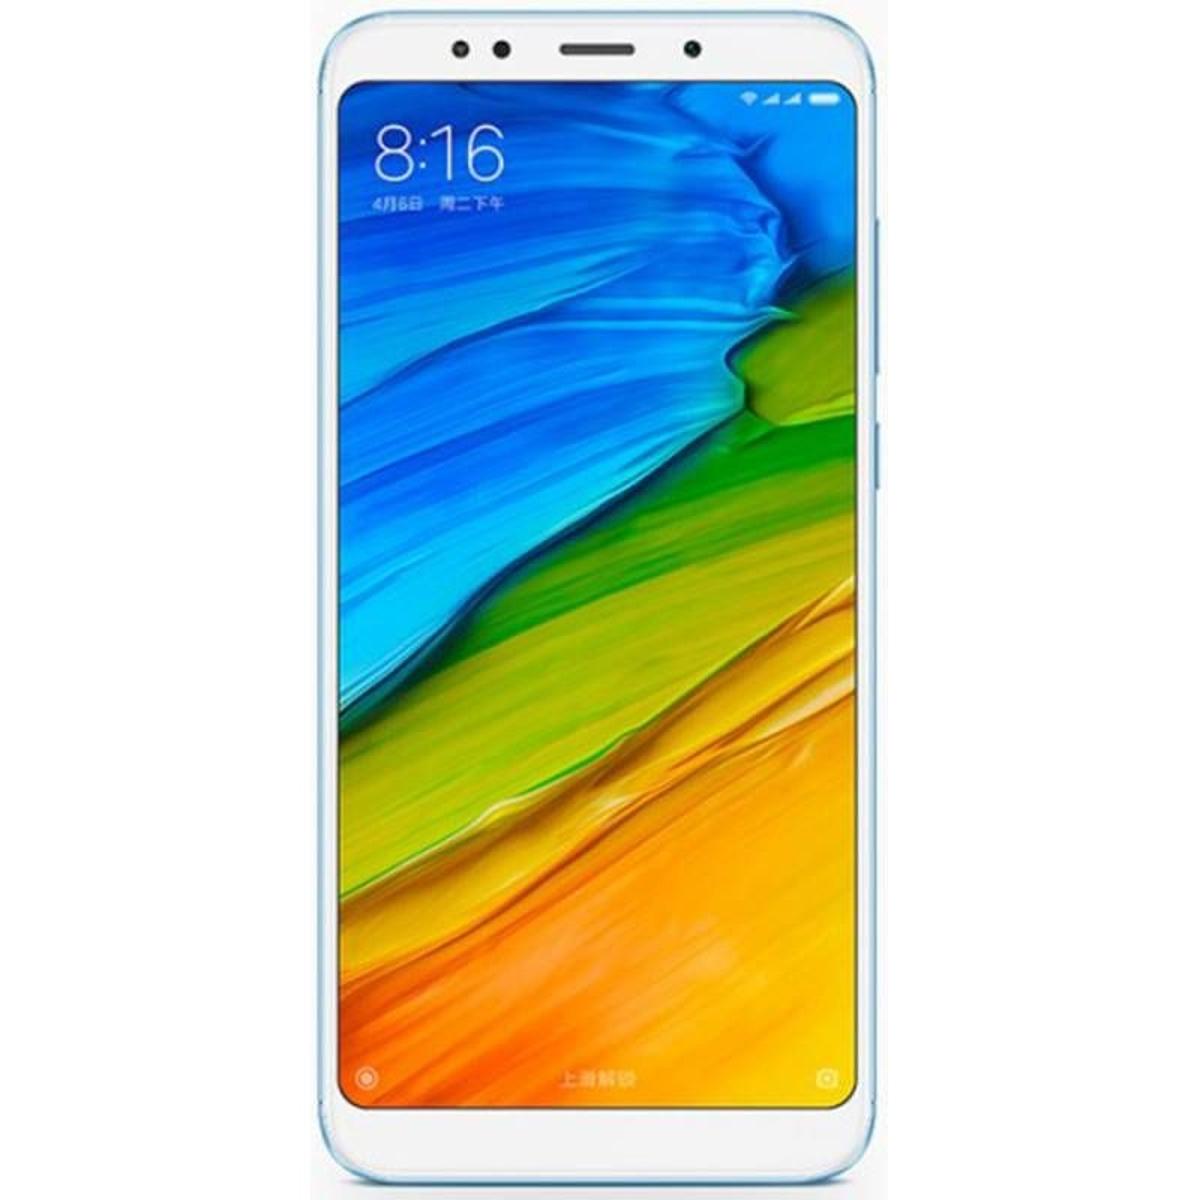 Smartphone Xiaomi Redmi 5 Plus - Double Sim - 32Go, 3Go RAM -